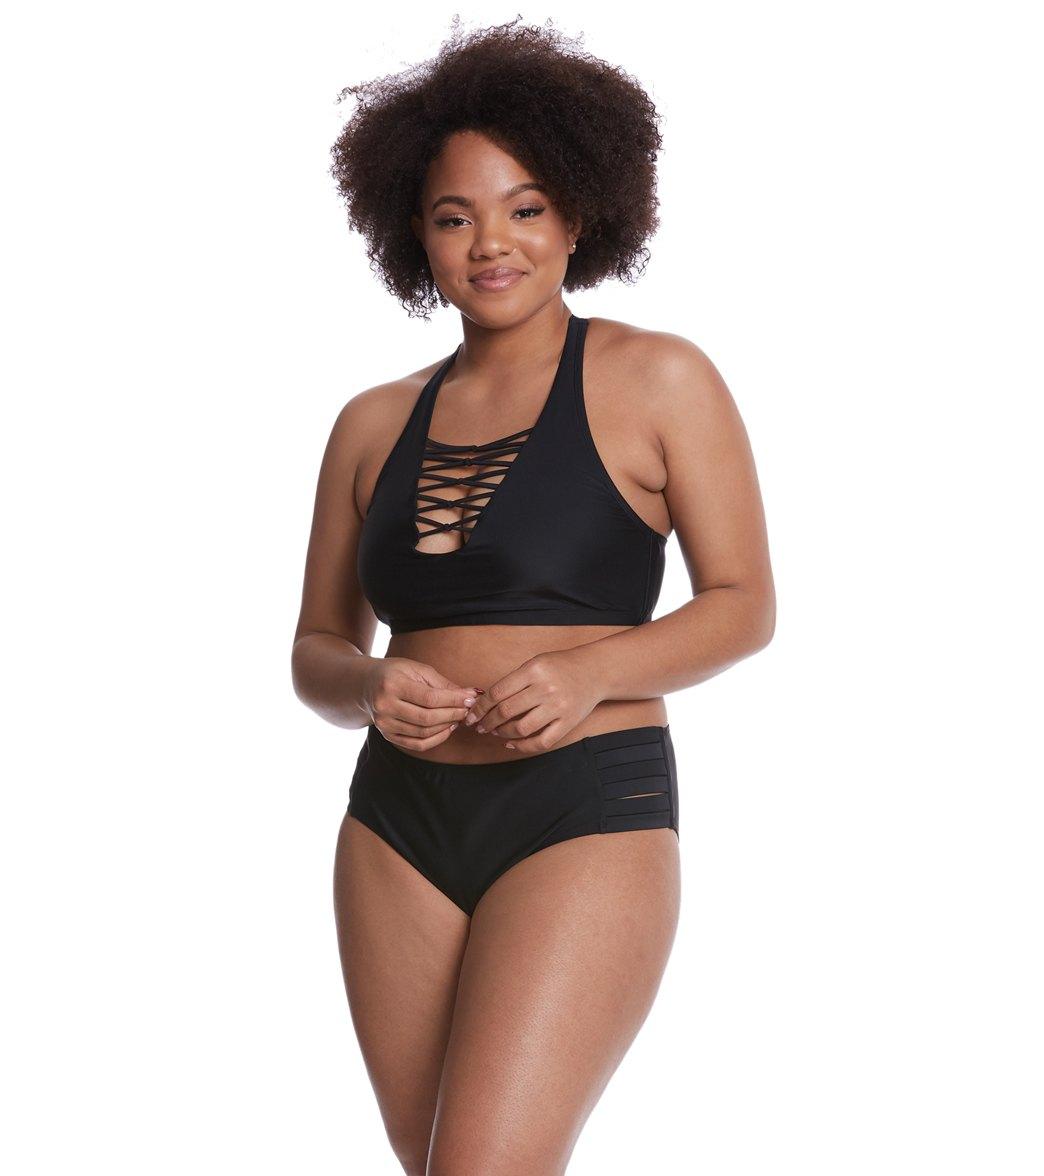 51ef0b73b2 Skye Plus Size Solid Kira Bikini Bottom at SwimOutlet.com - Free ...